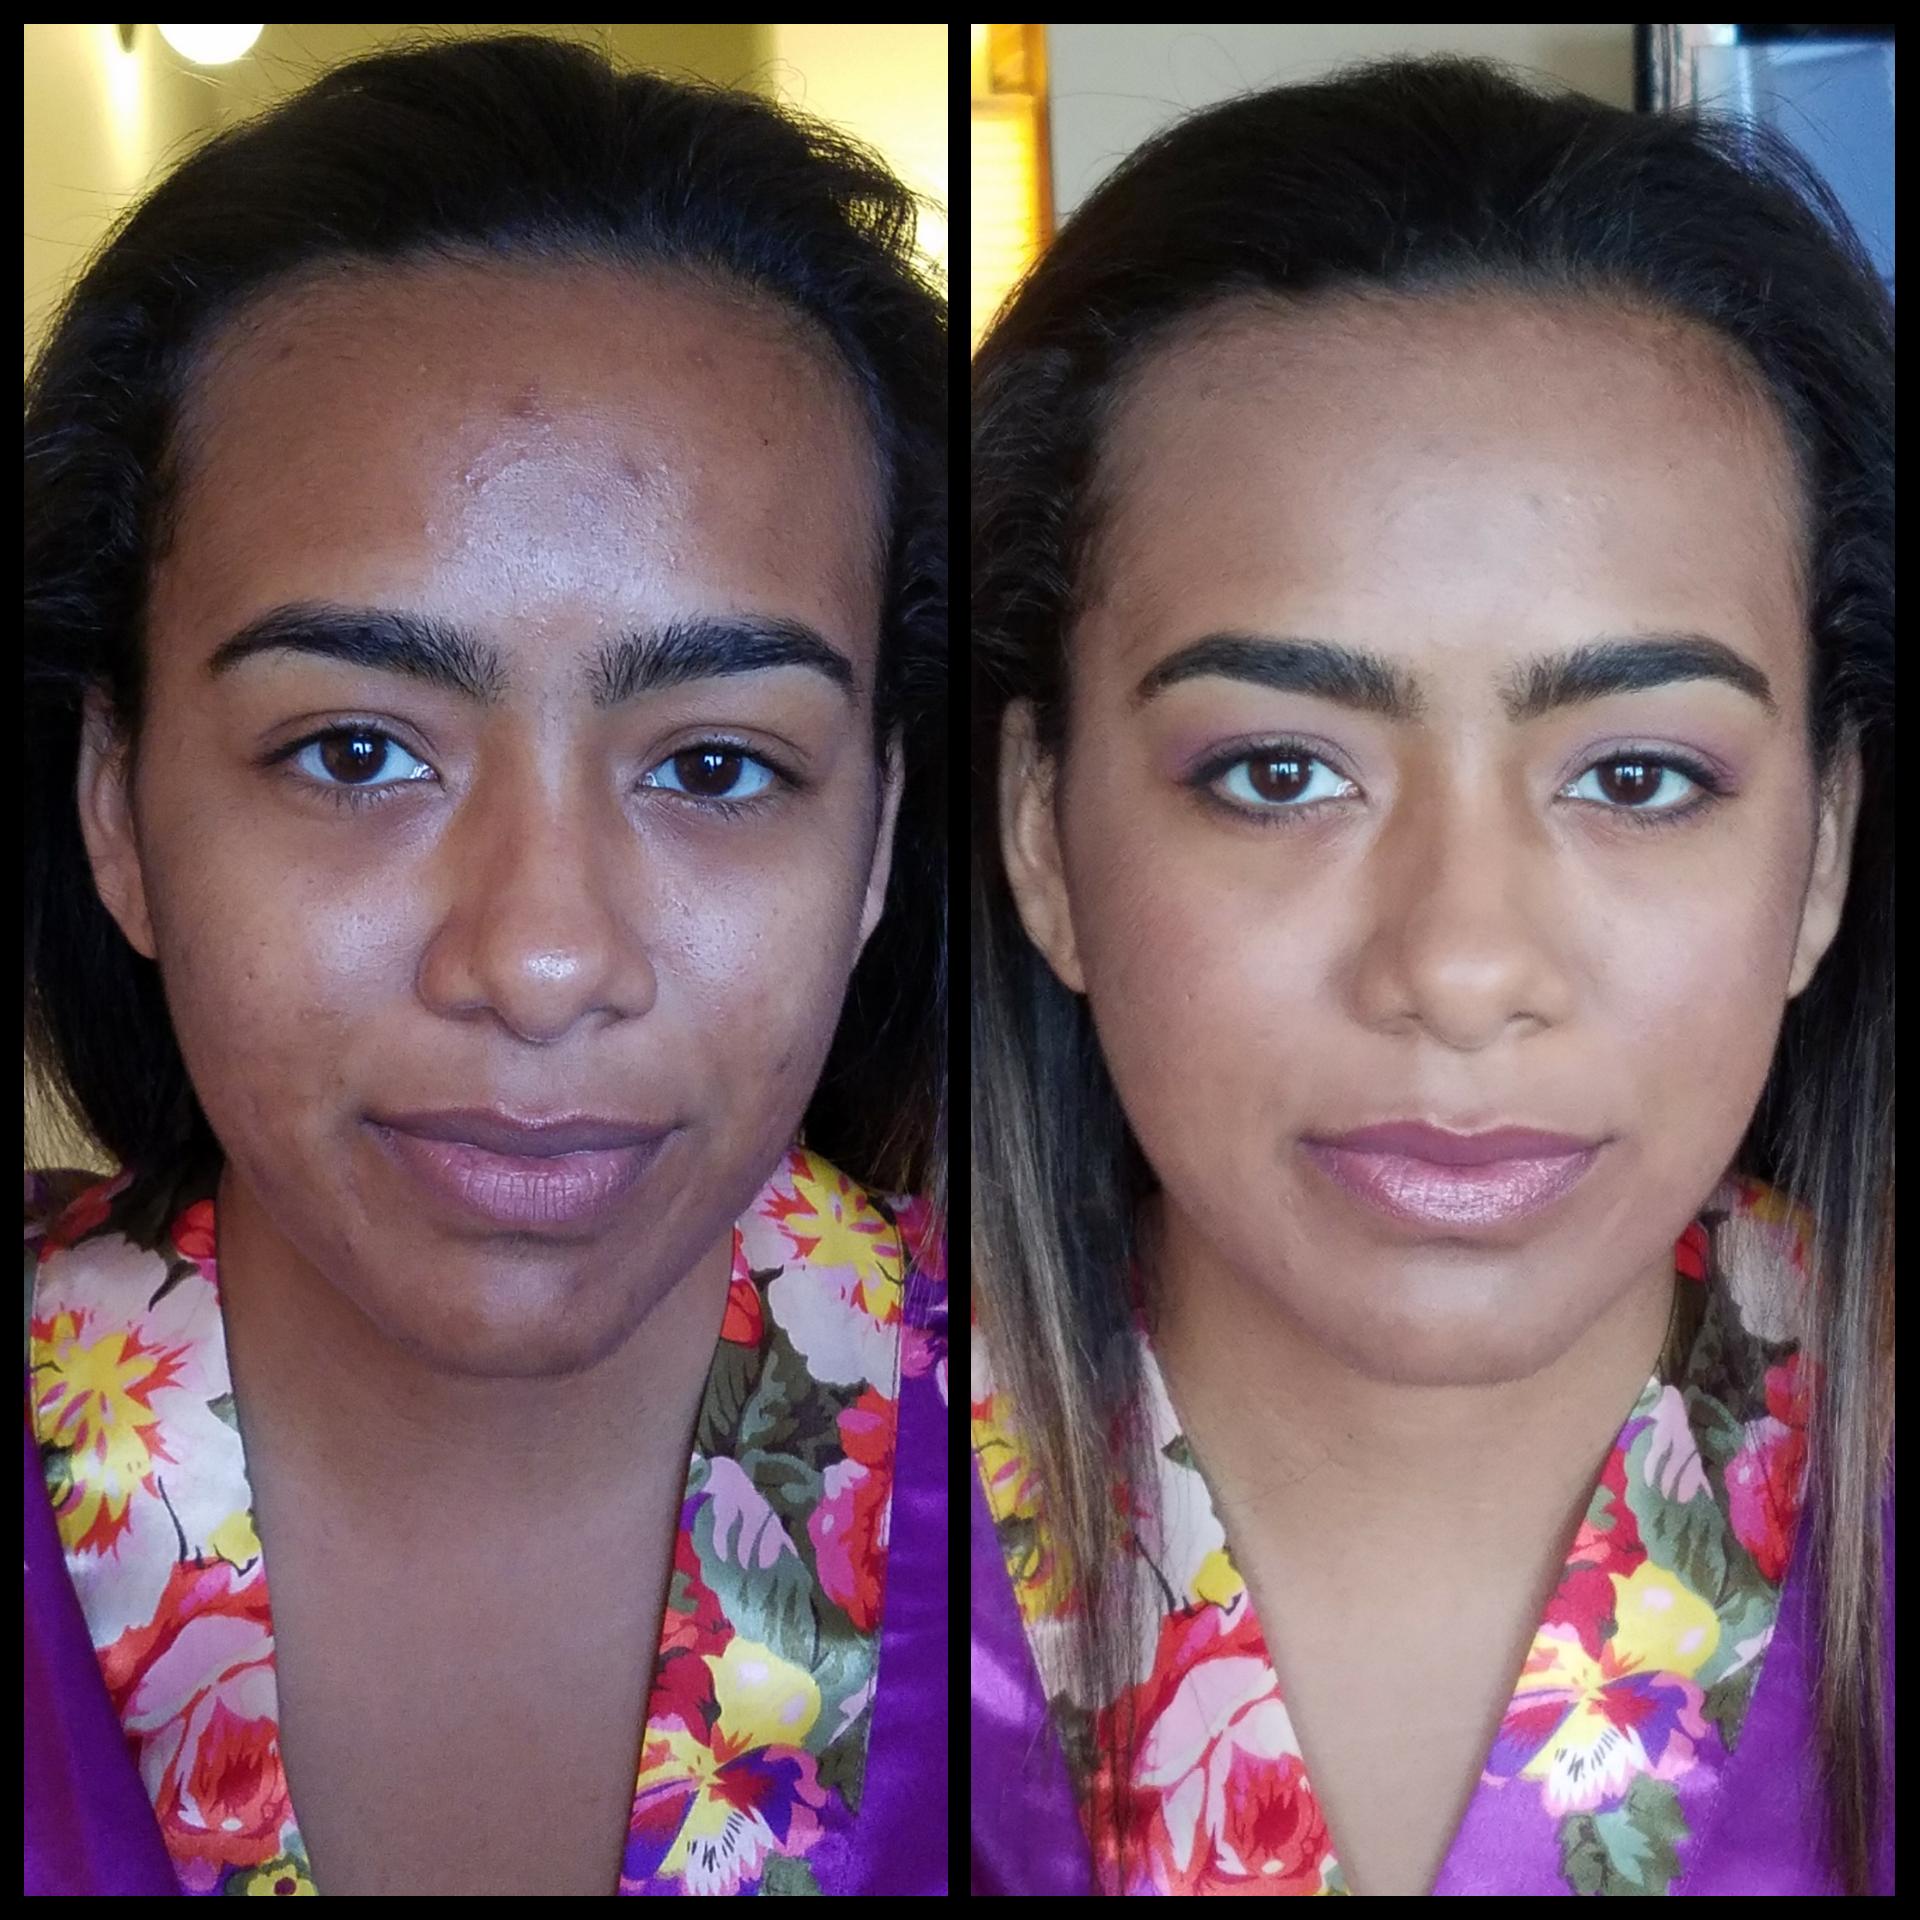 Subtle Bridesmaids Makeup. Acne Covering and Skin Tone Evening. Luminous Beauty Makeup Artist..png